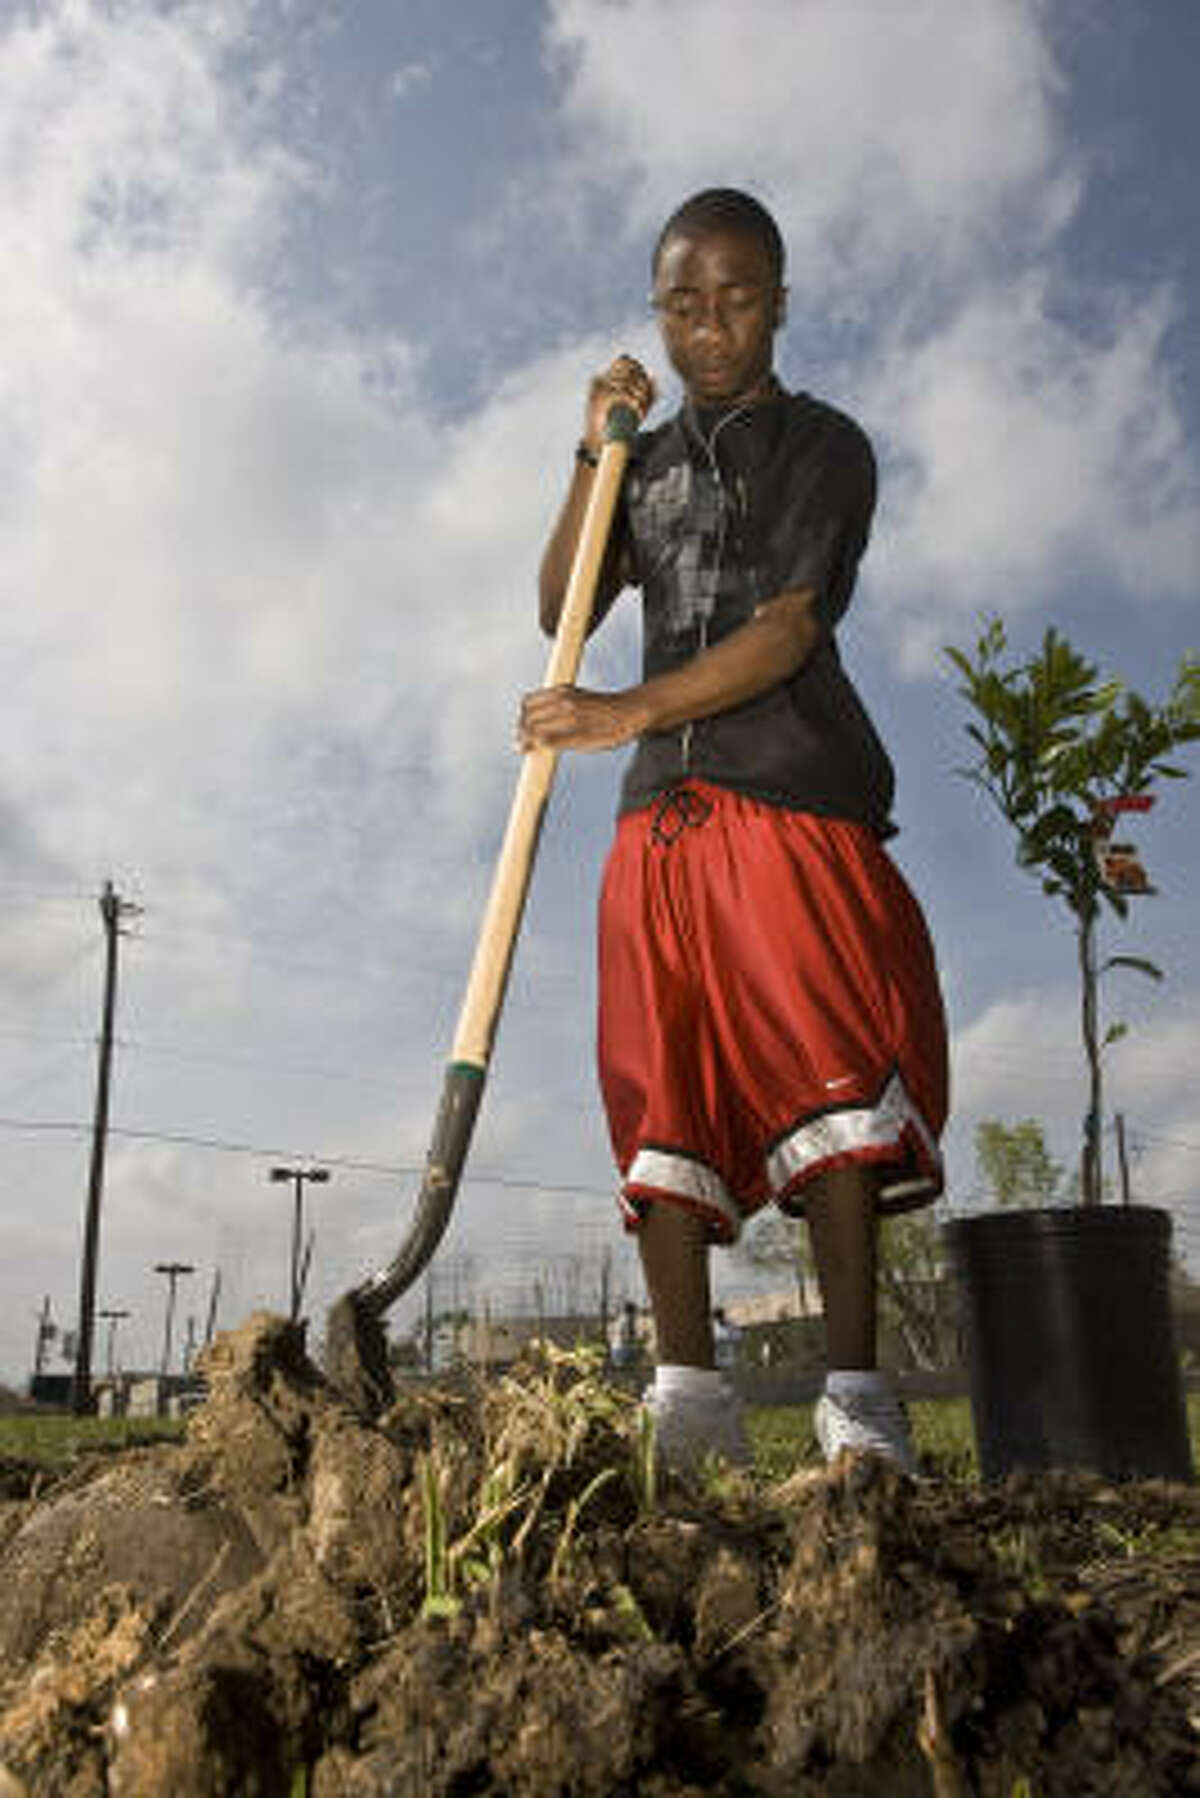 Henry Guzman, 17, helps in the new community garden at Houston's Sunnyside Multi-Service Center.